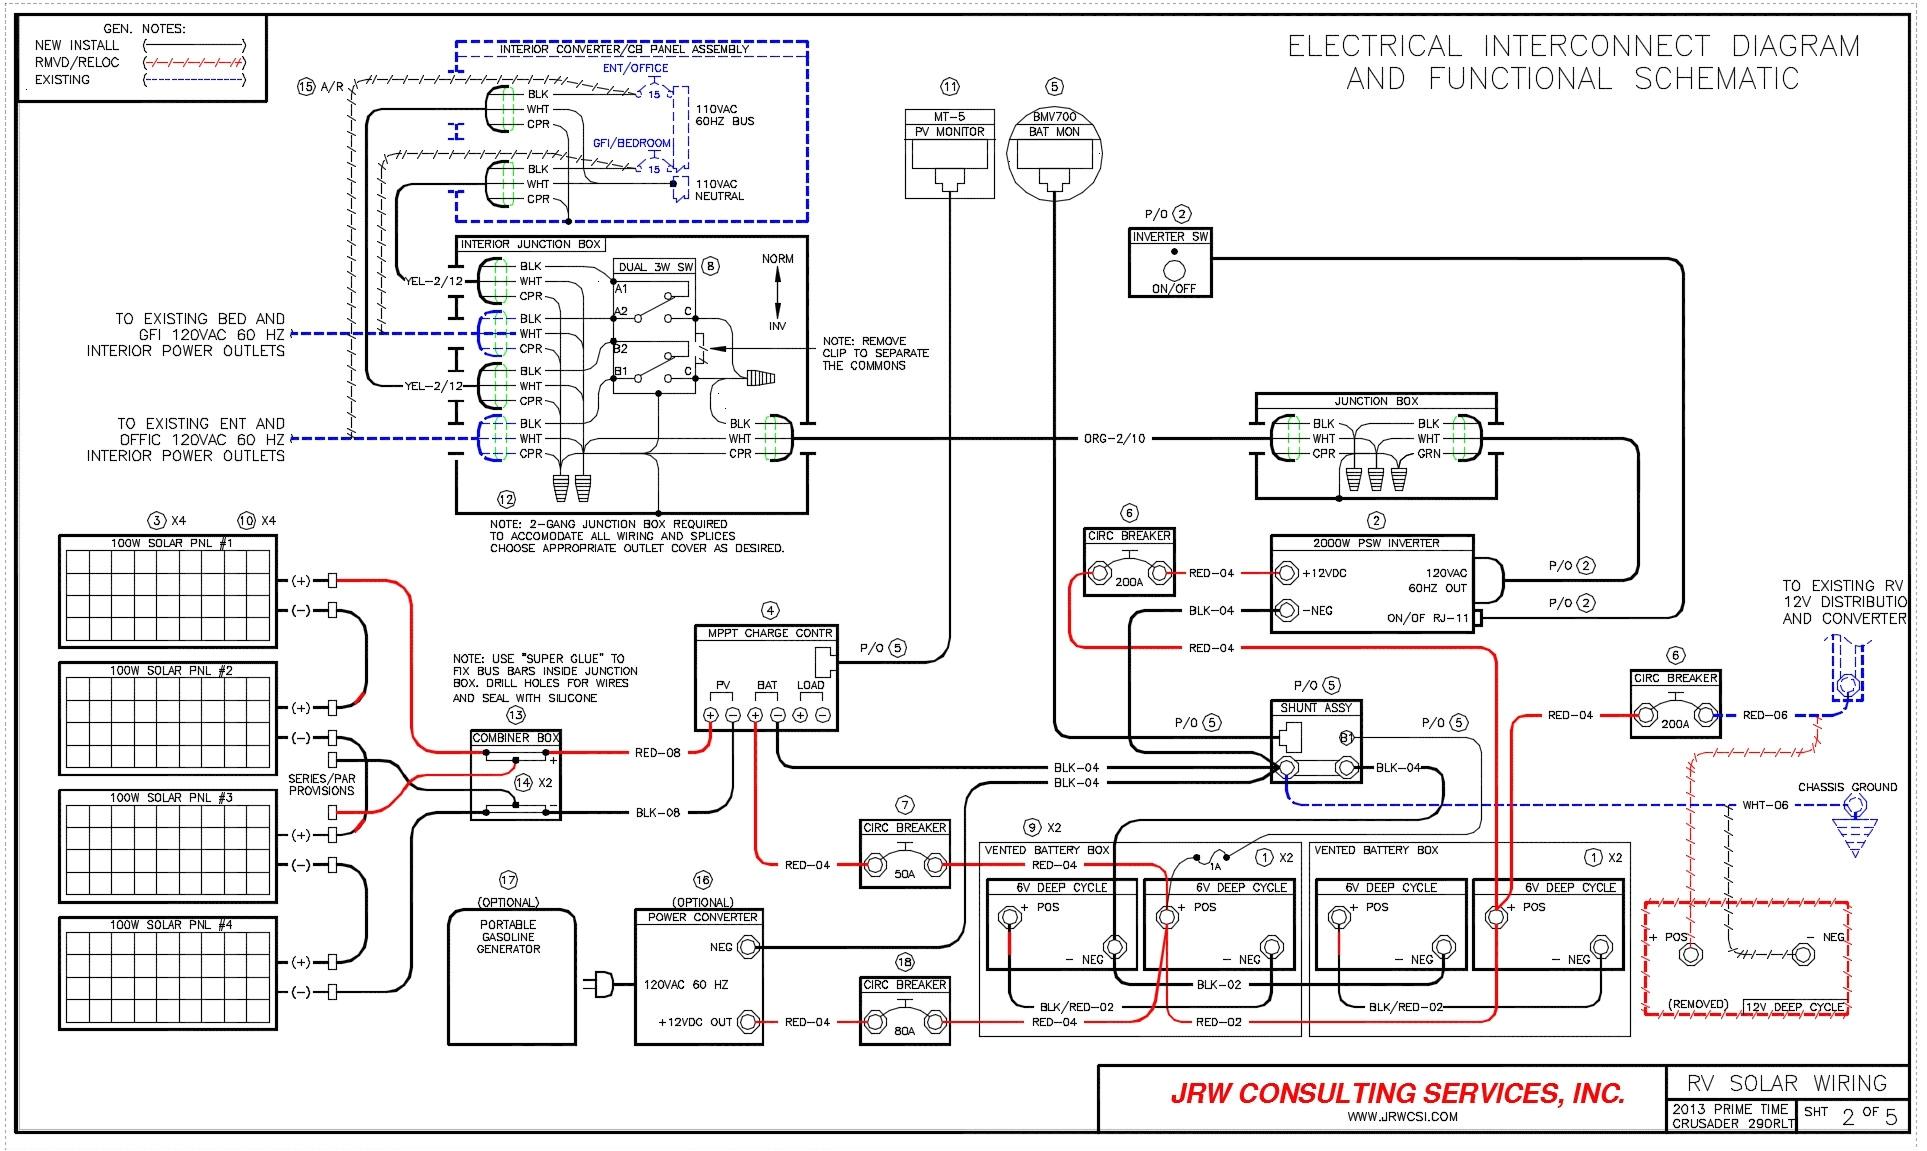 holiday rambler wiring diagrams my wiring diagram holiday rambler rv wiring diagram